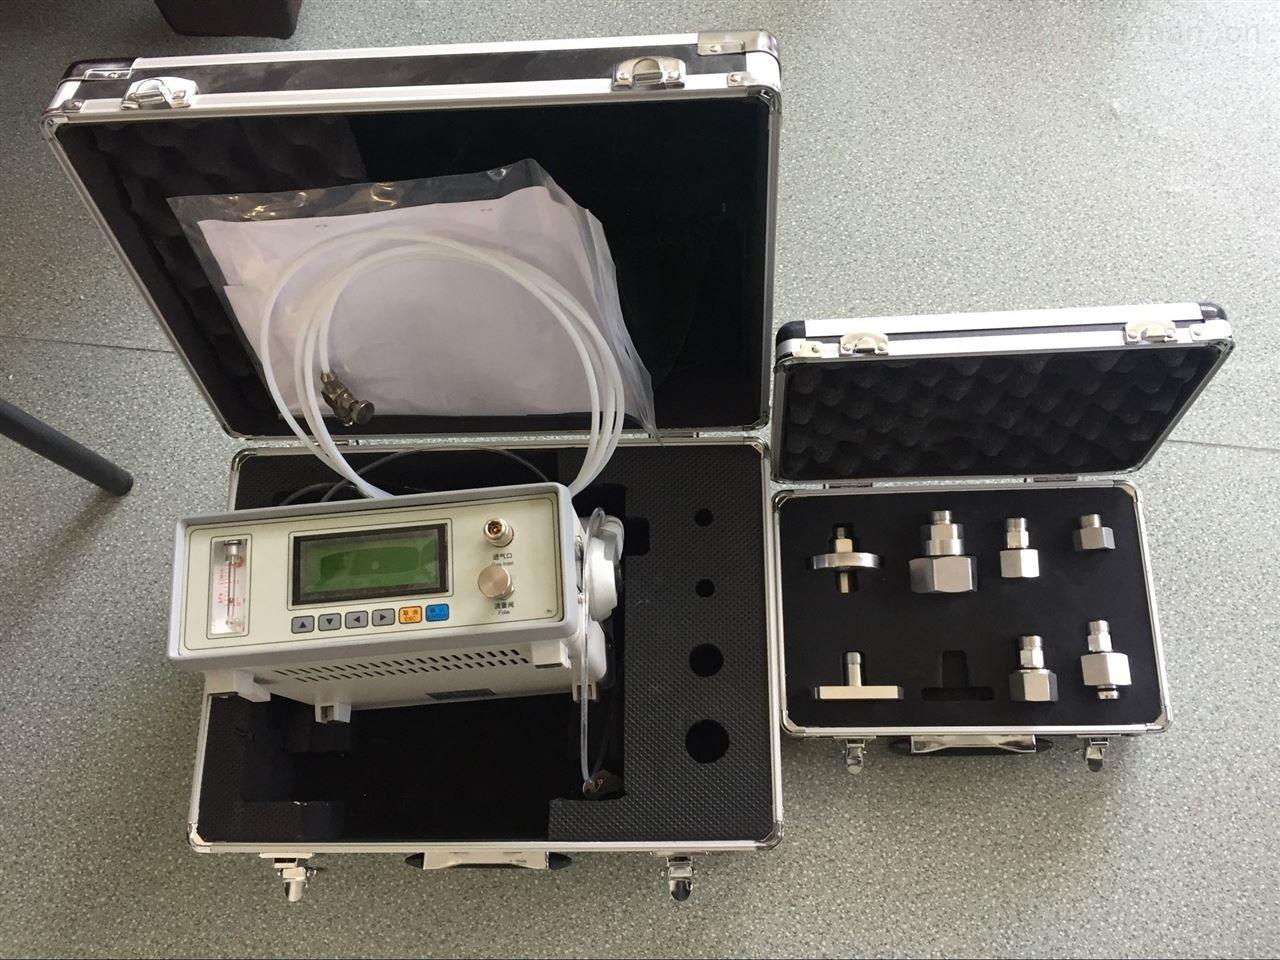 SF6智能微水仪 六氟化硫智能水分测定仪